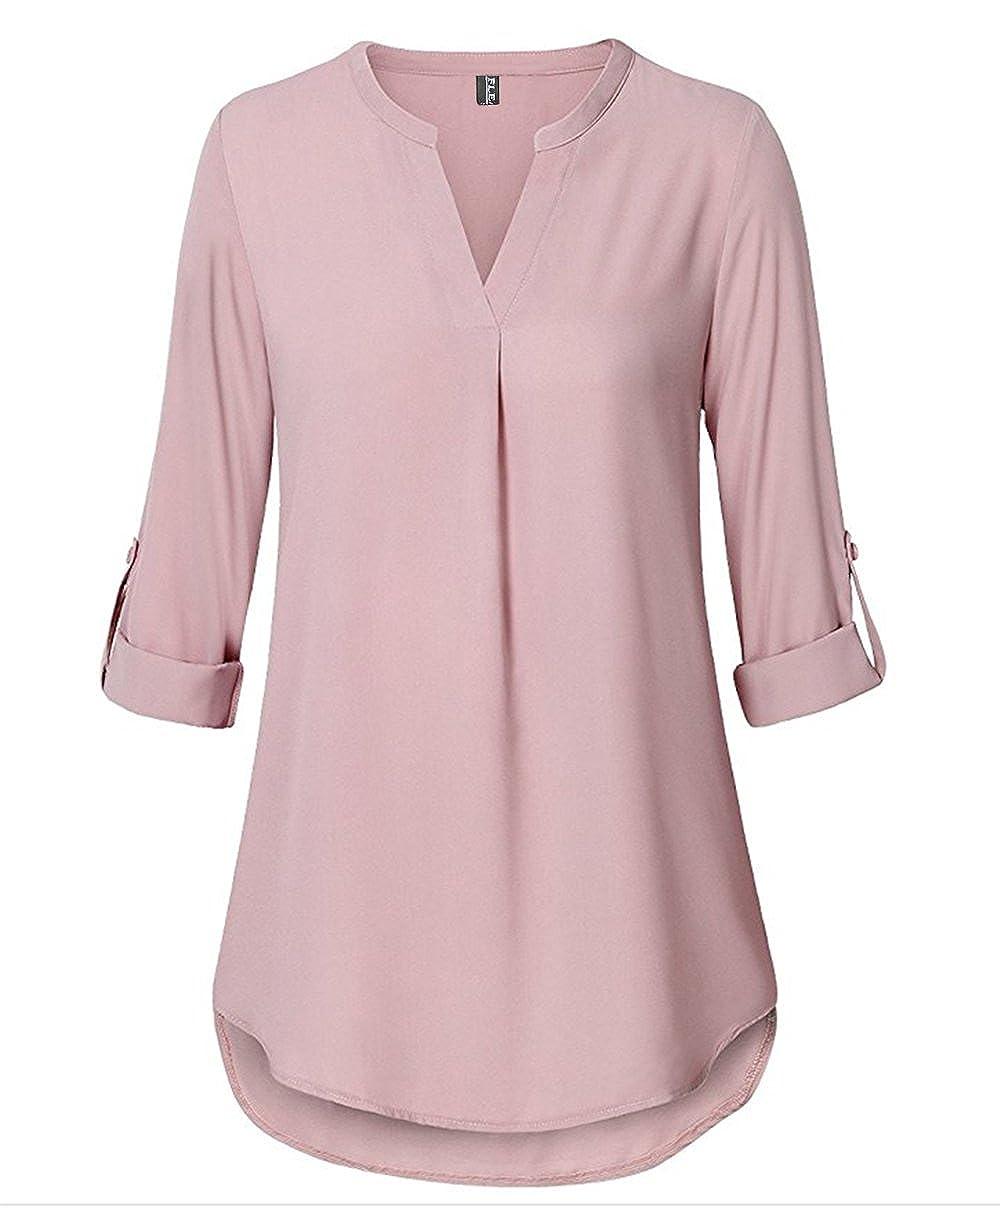 Fleasee Damen Einfarbig Chiffon Bluse V-Ausschnitt Elegante Langarm Tunika Casual Top mit 3/4 Ärmel Locker F7100